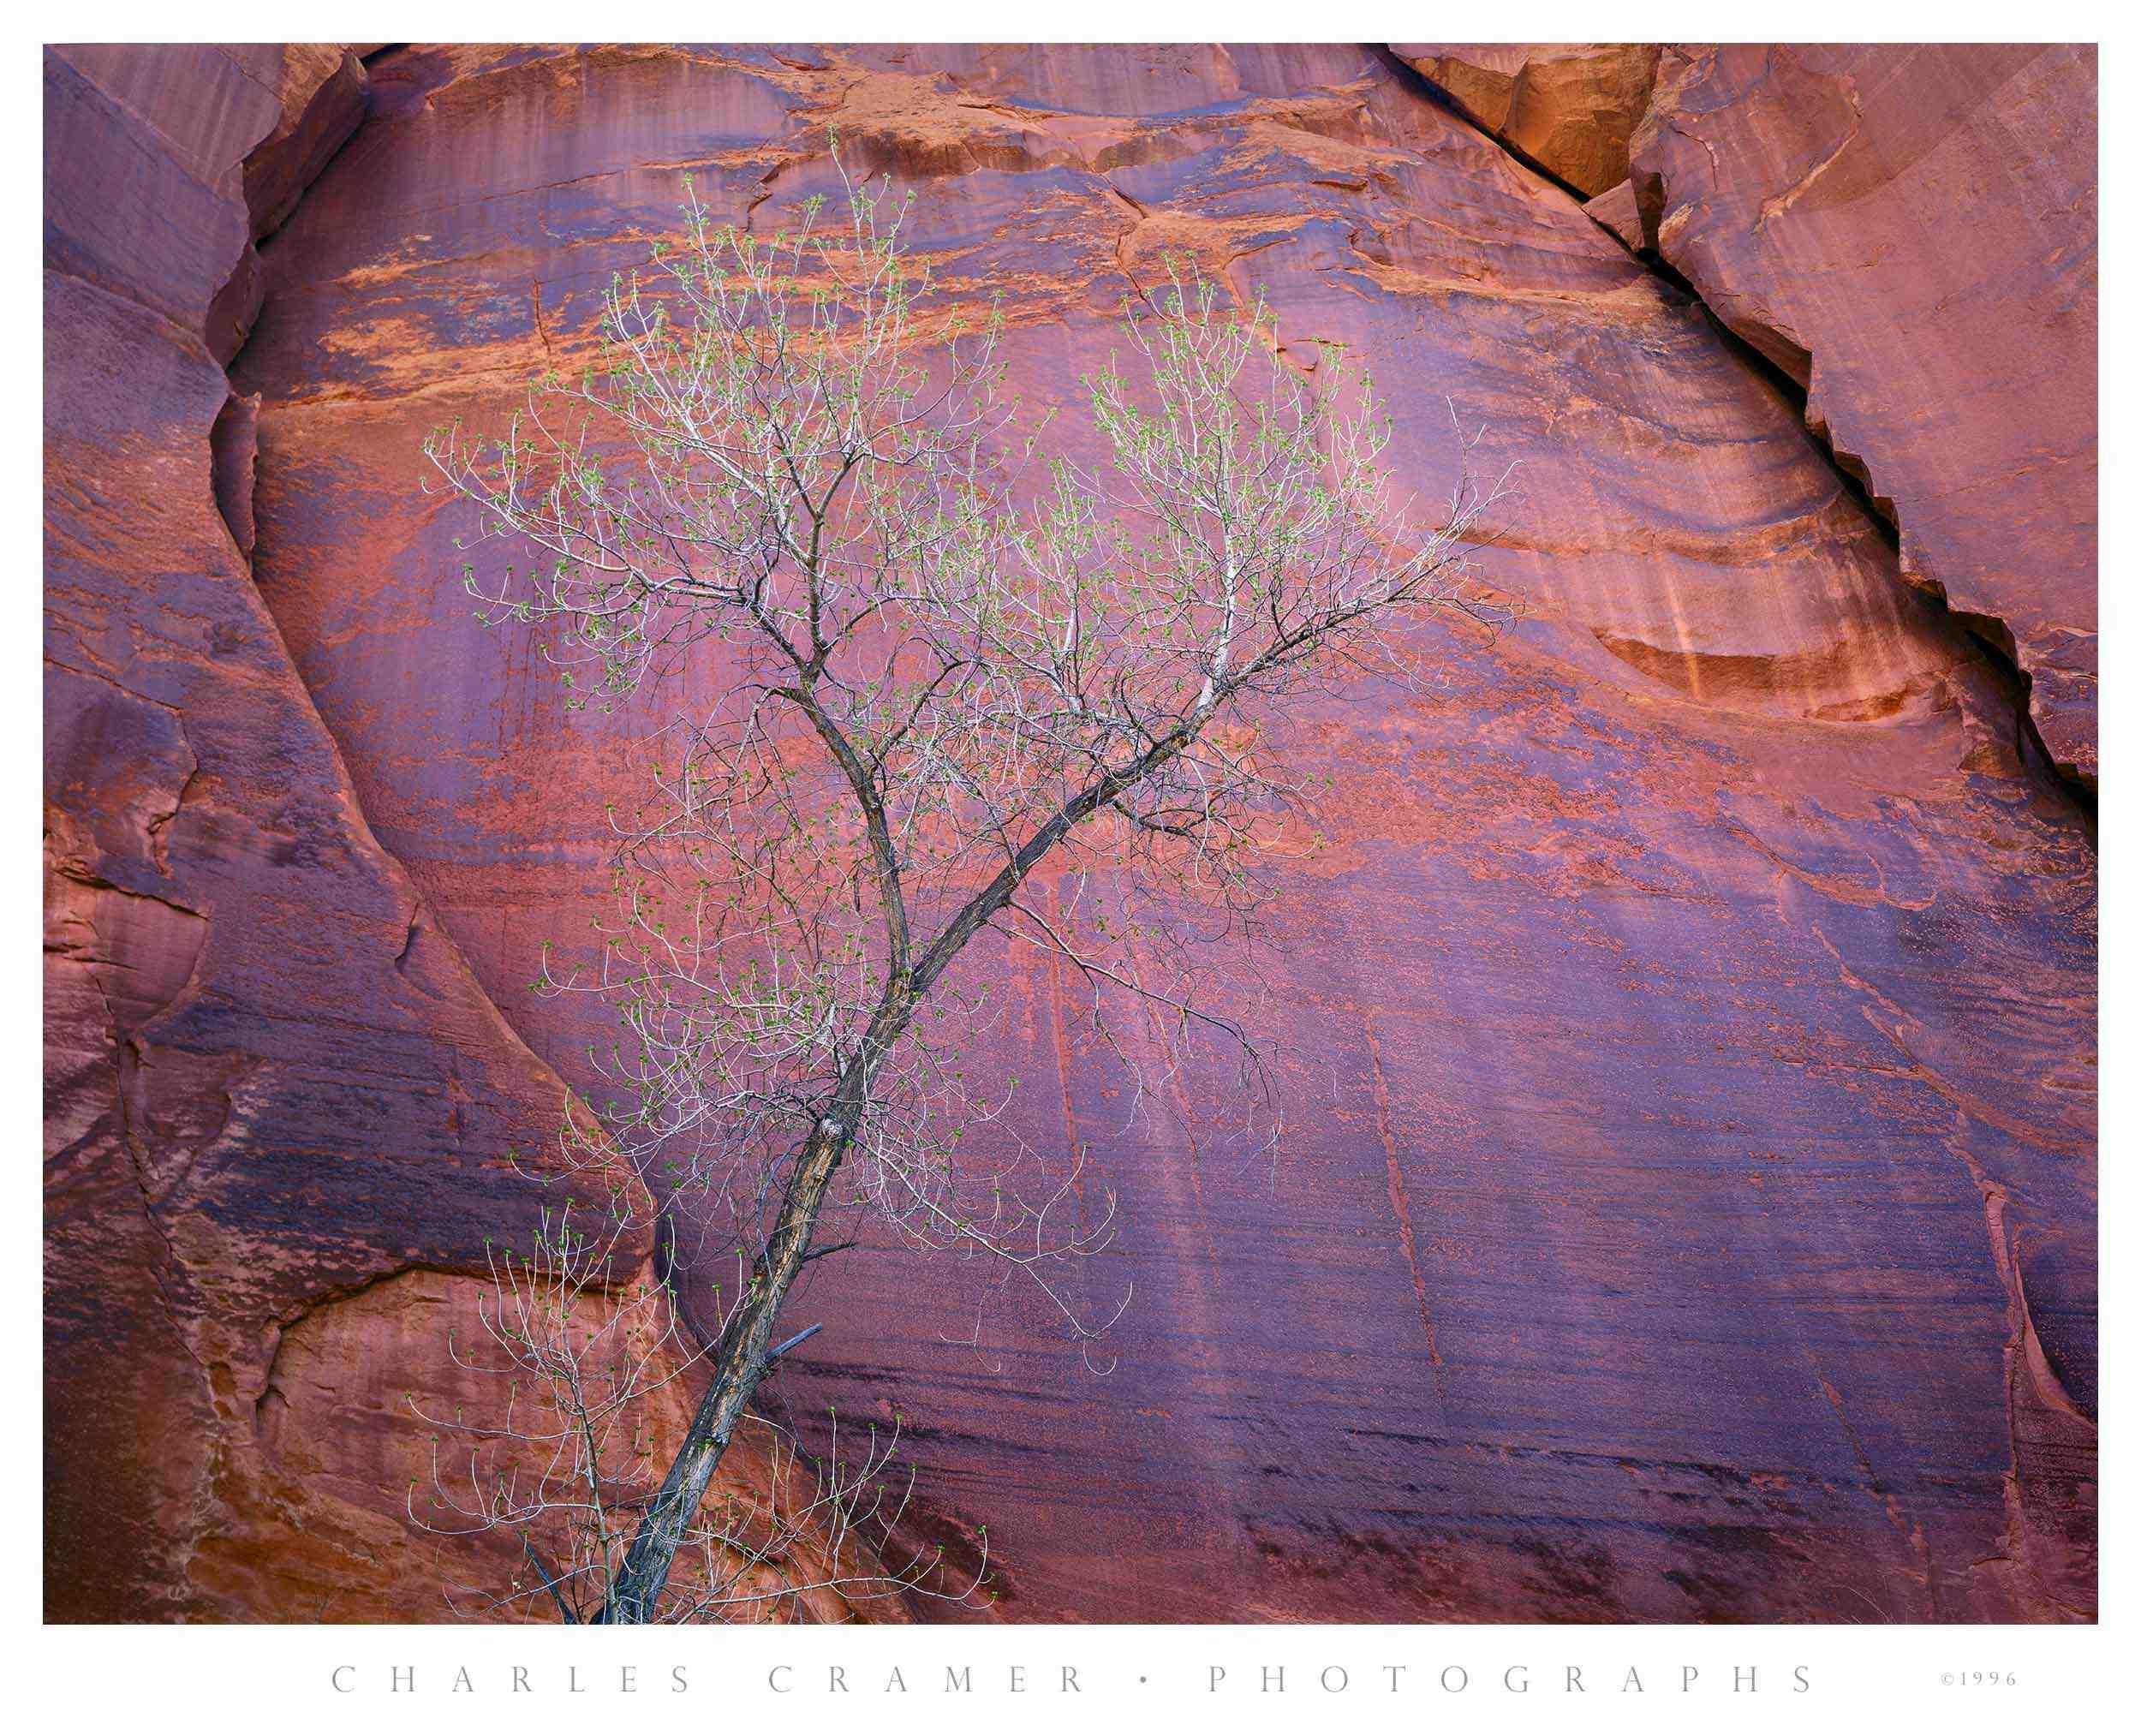 Cottonwood, Canyon Wall, Escalante Canyon, Utah